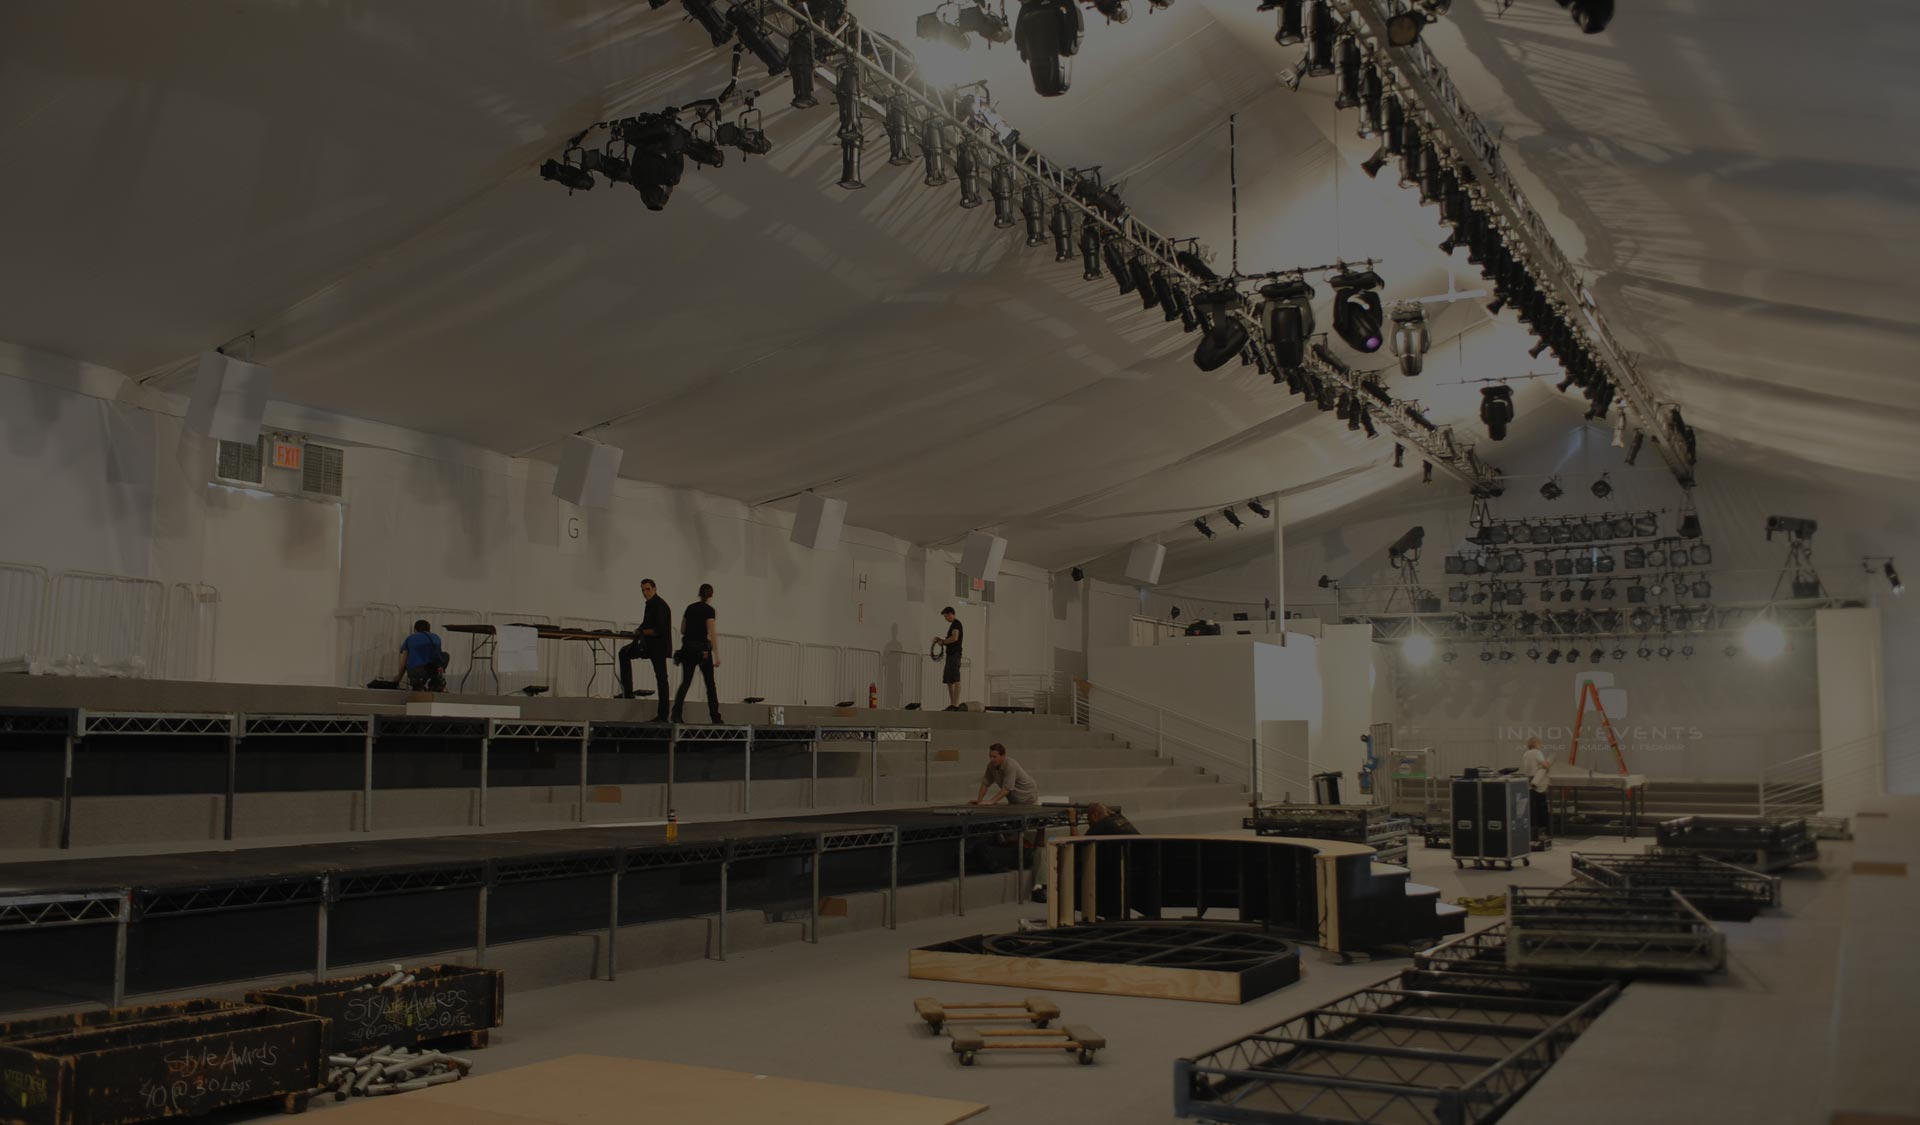 innov-events-organise-tous-vos-evenements-professionnels